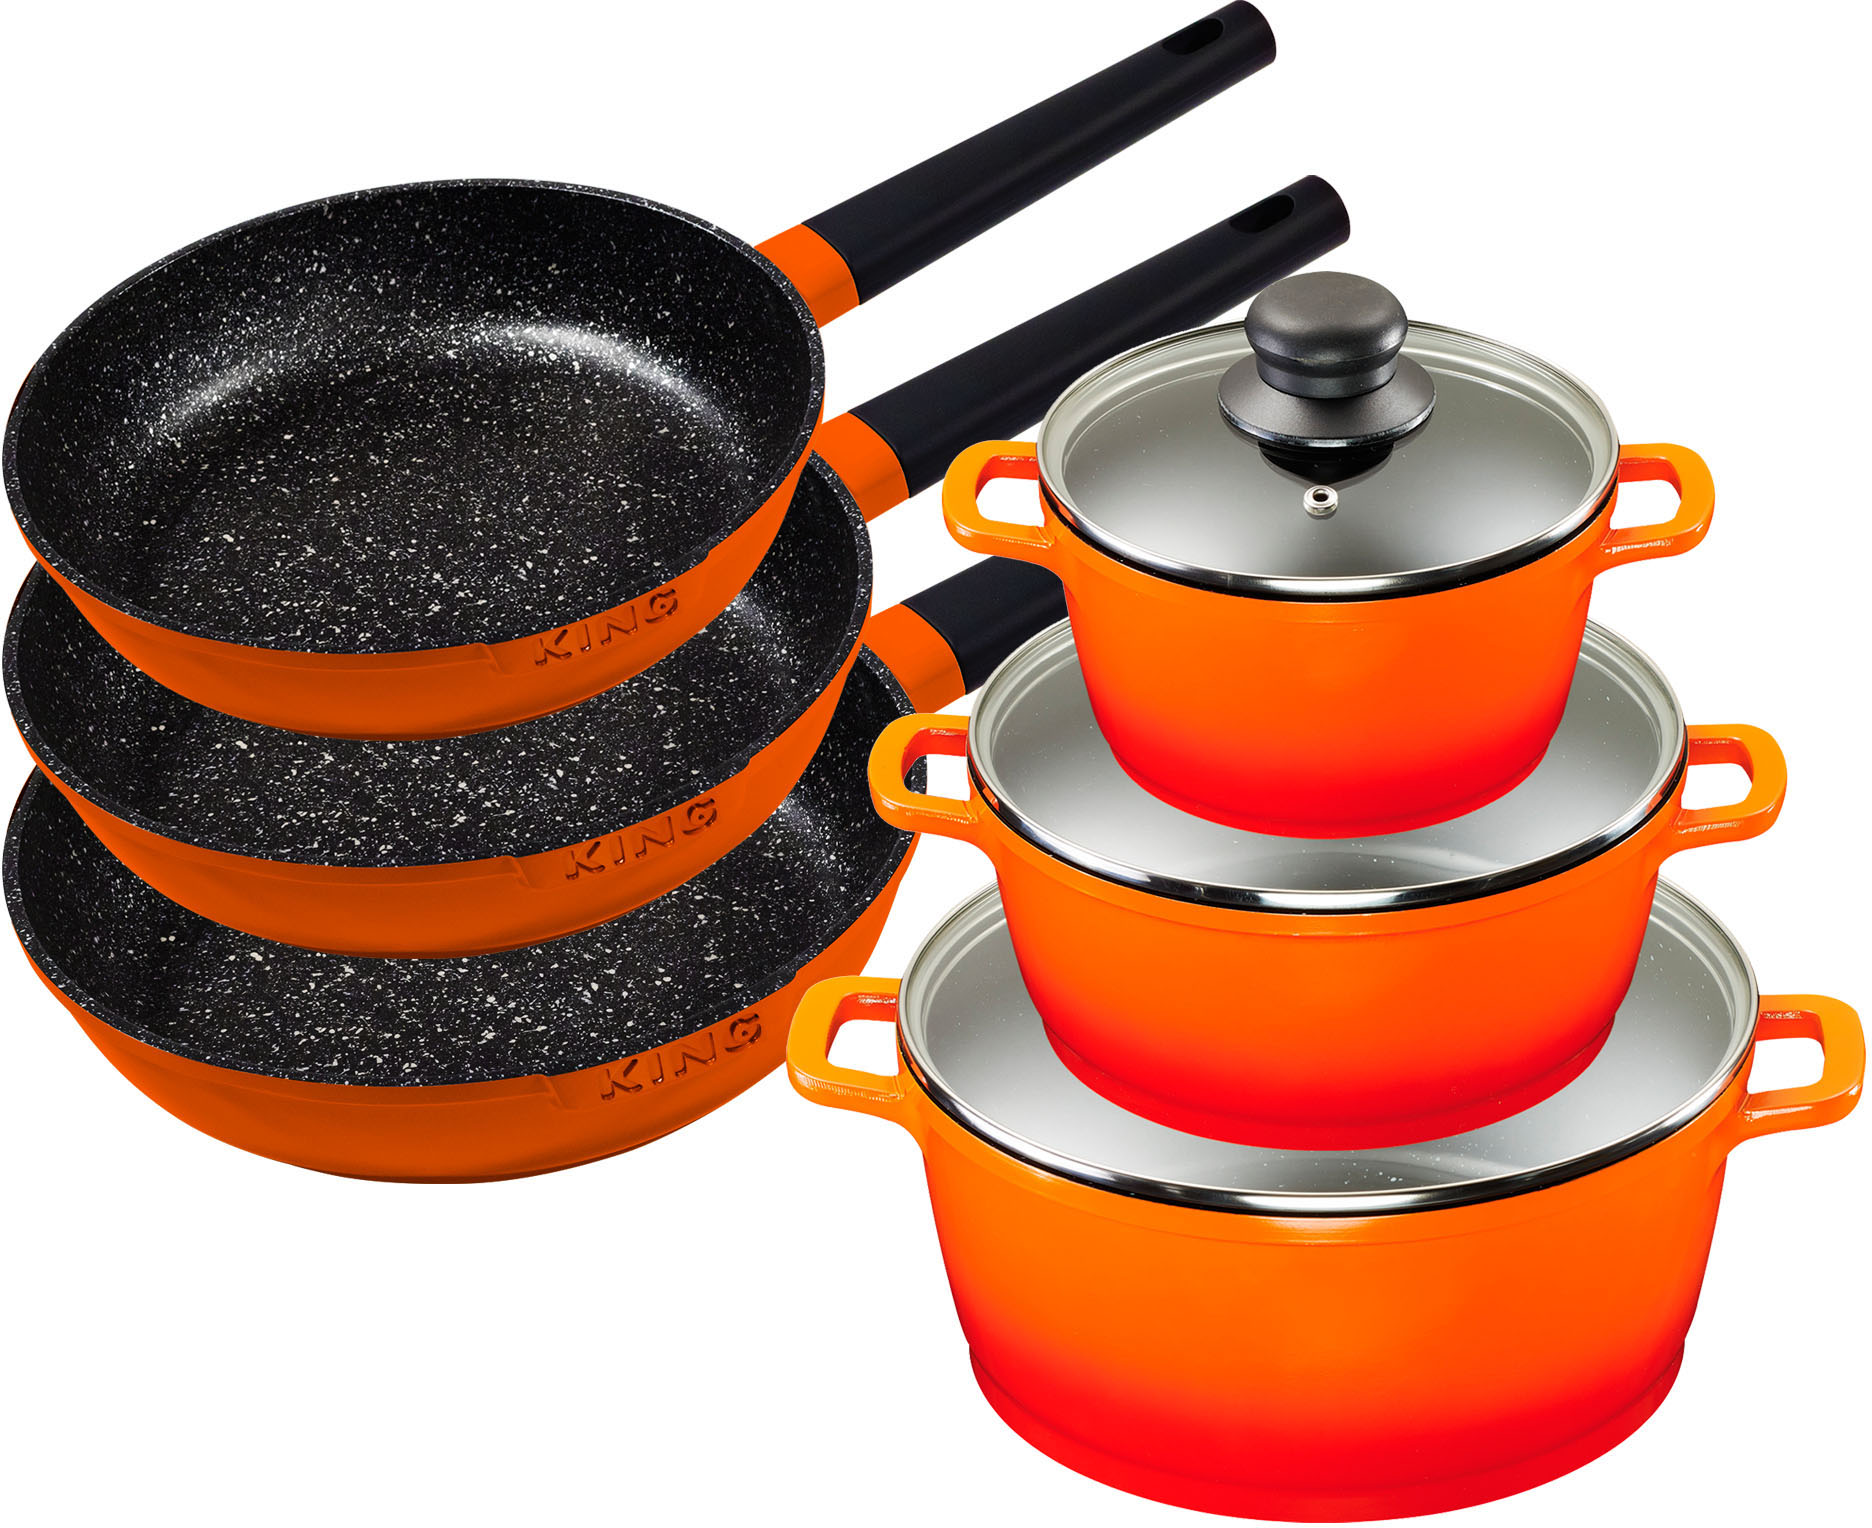 KING Topf-Set Shine Orange (Set, 9-tlg., 3 Pfannen, Töpfe, Deckel) orange Topfsets Töpfe Haushaltswaren Topf